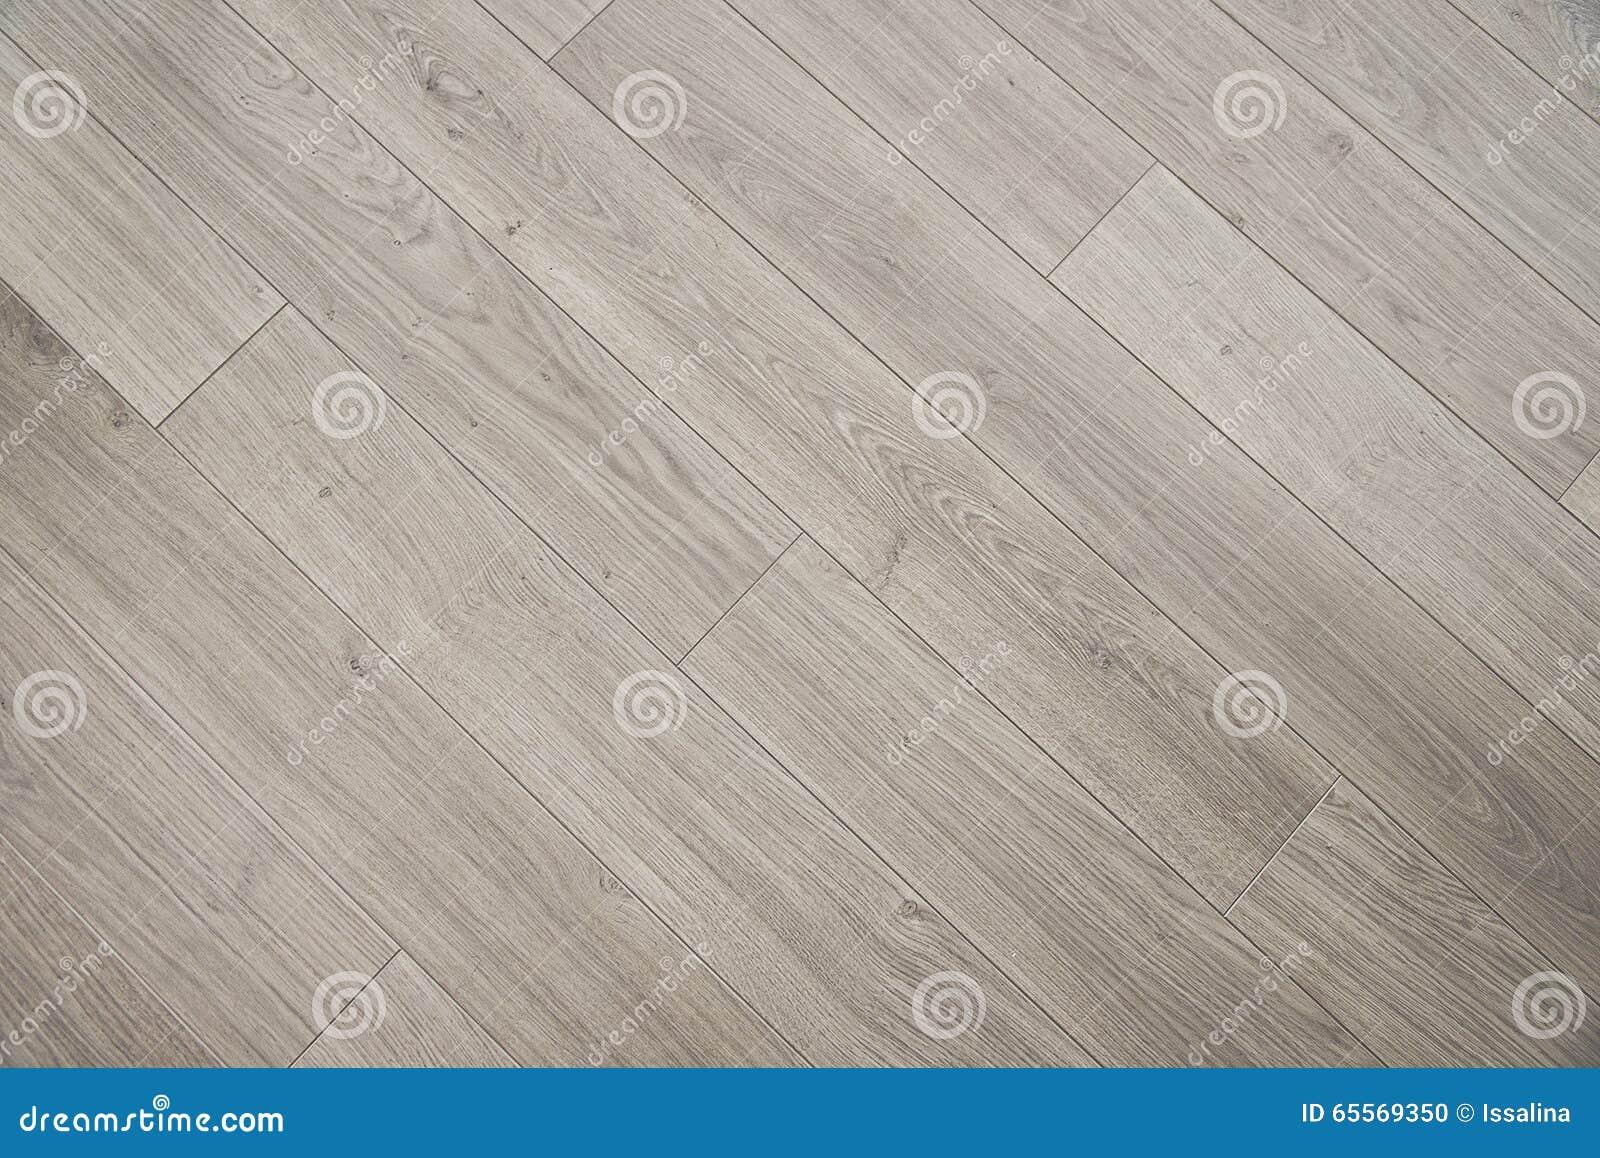 Textura de madera gris clara del fondo del piso foto de - Piso madera gris ...